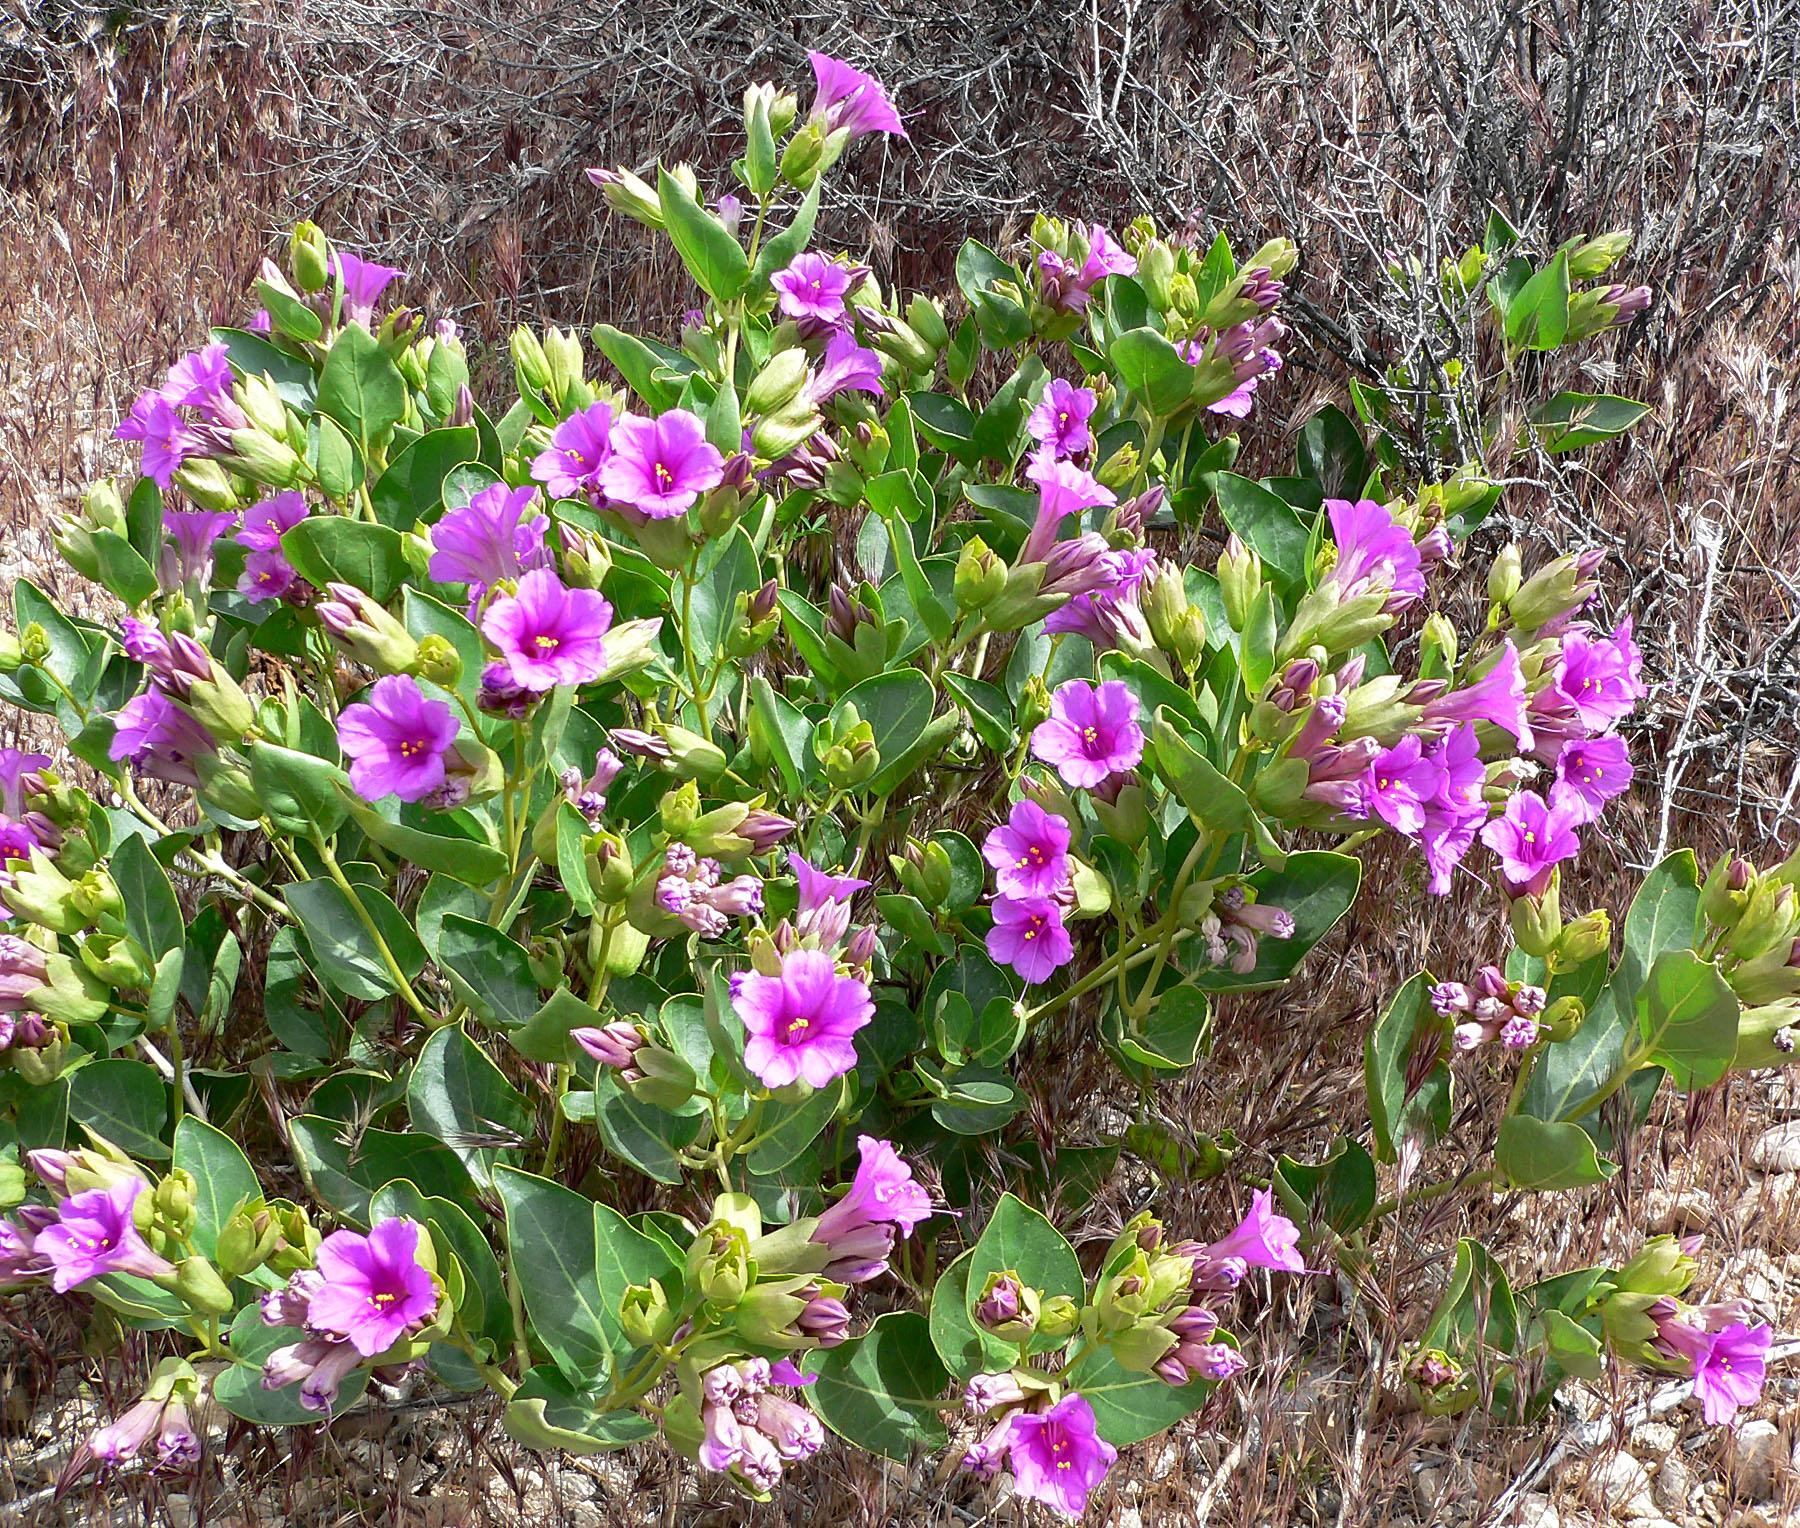 Southwest Colorado Wildflowers, Mirabilis multiflora